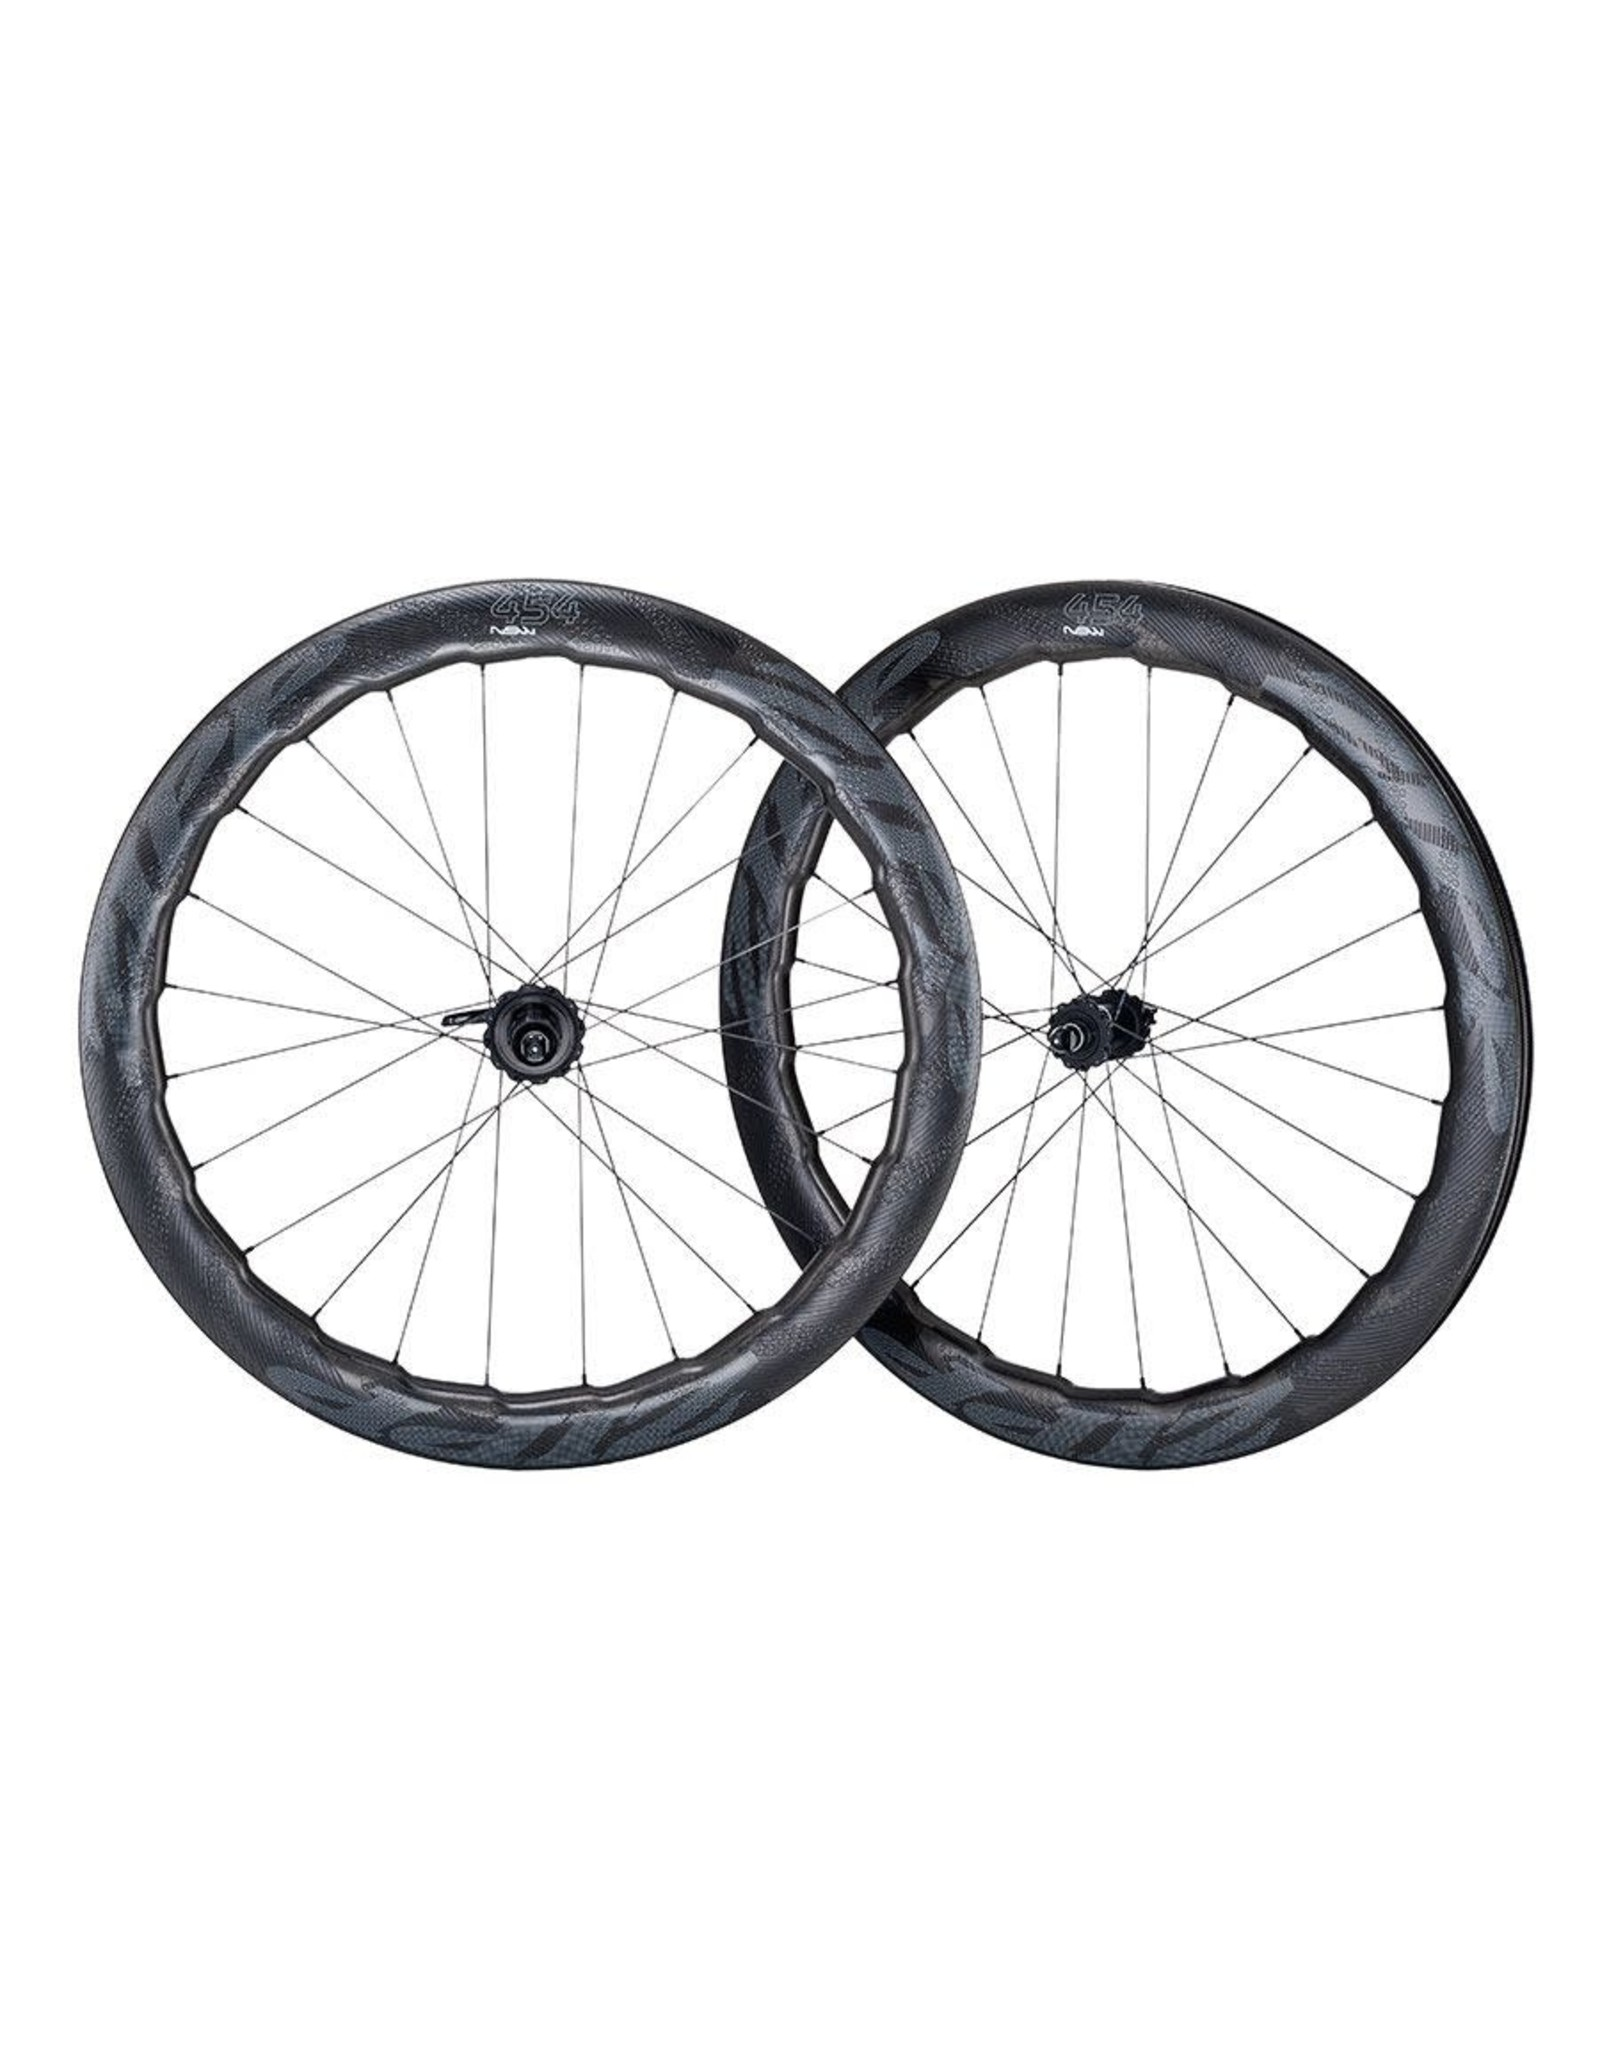 Zipp ZIPP, 454 NSW, Disc Wheelset, Shimano cl